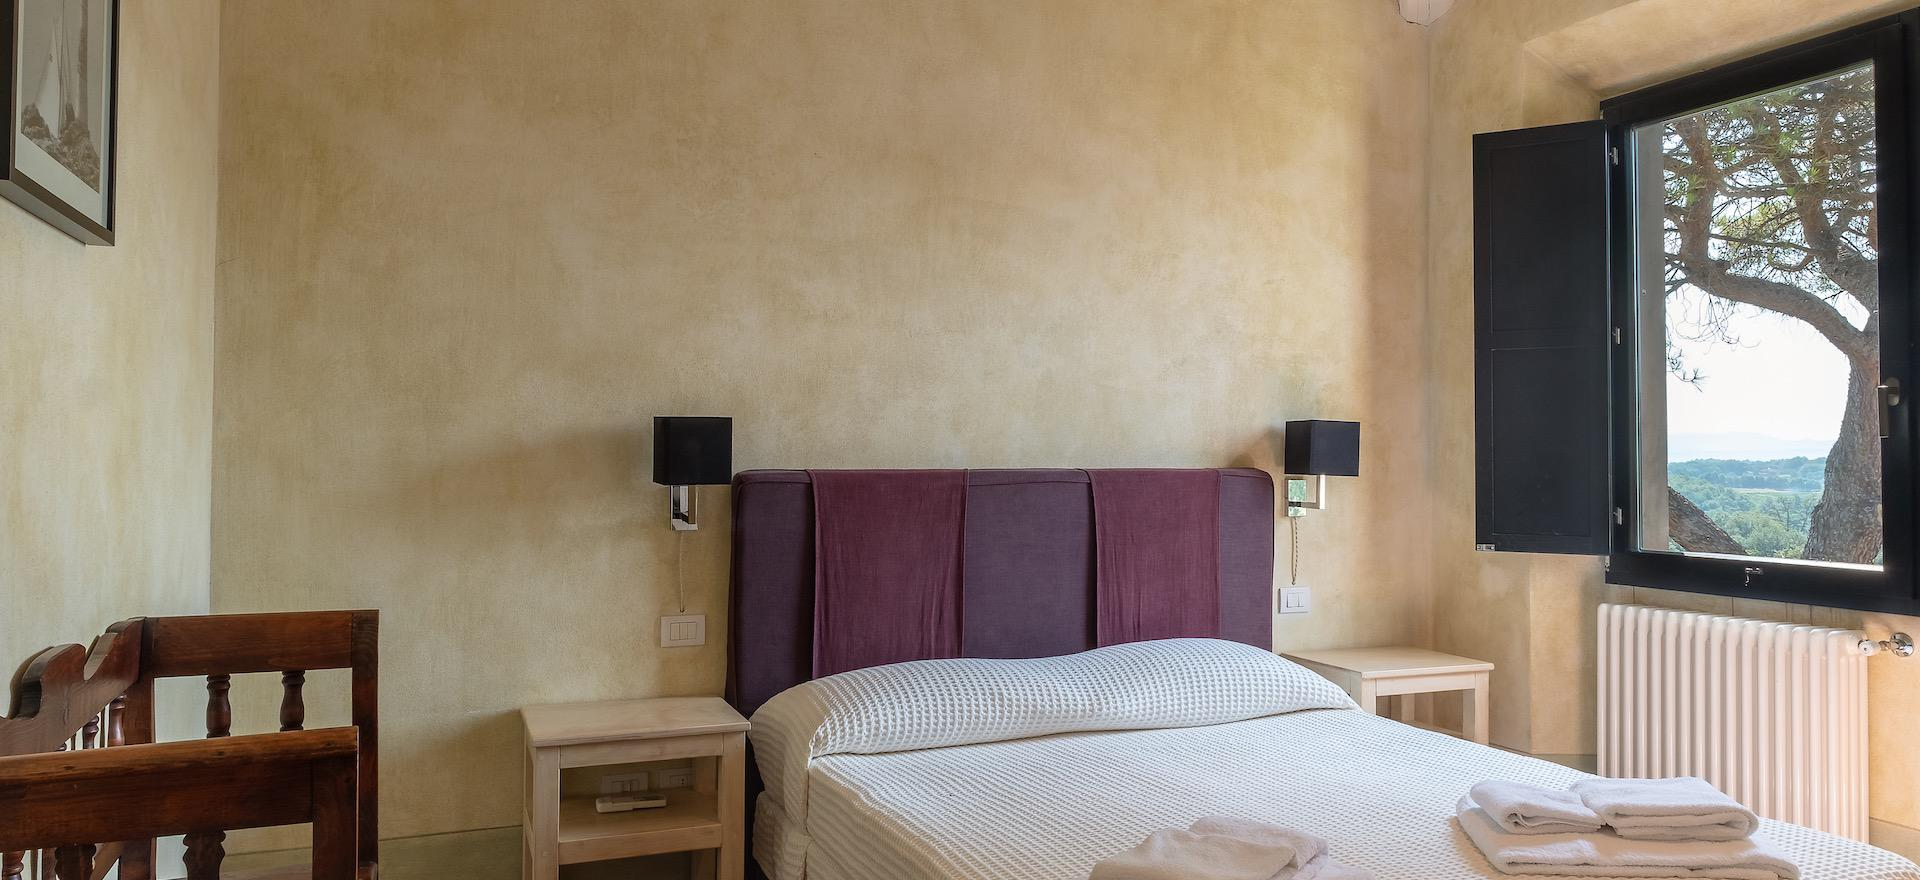 Mooie wijnboerderij in de Chiantistreek in Toscane